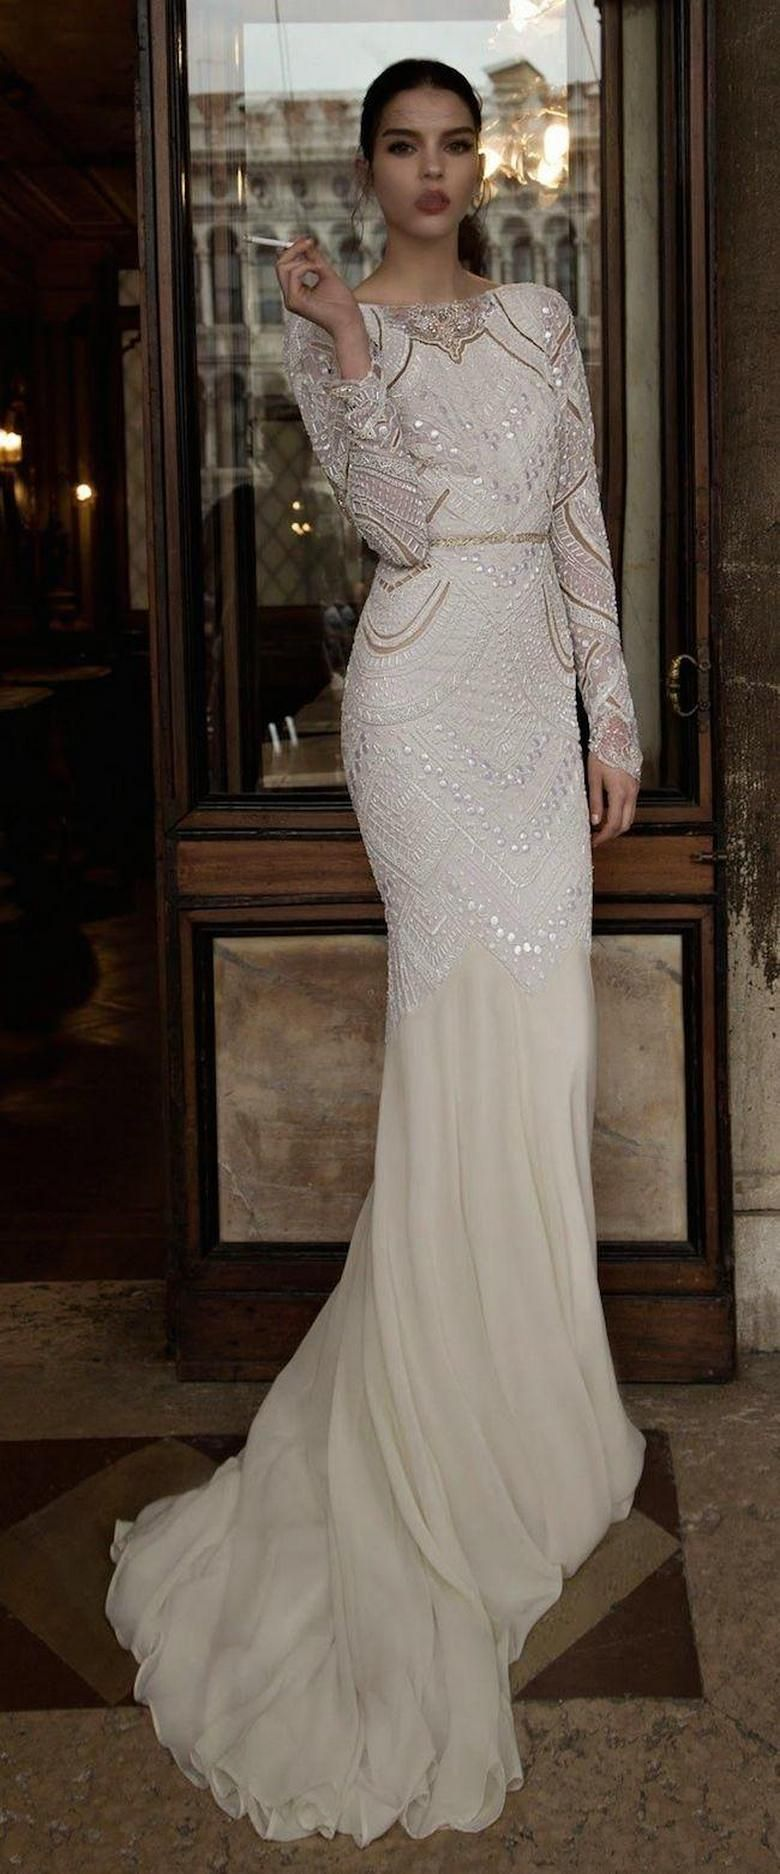 40 high low long sleeve modern wedding dresses ideas with